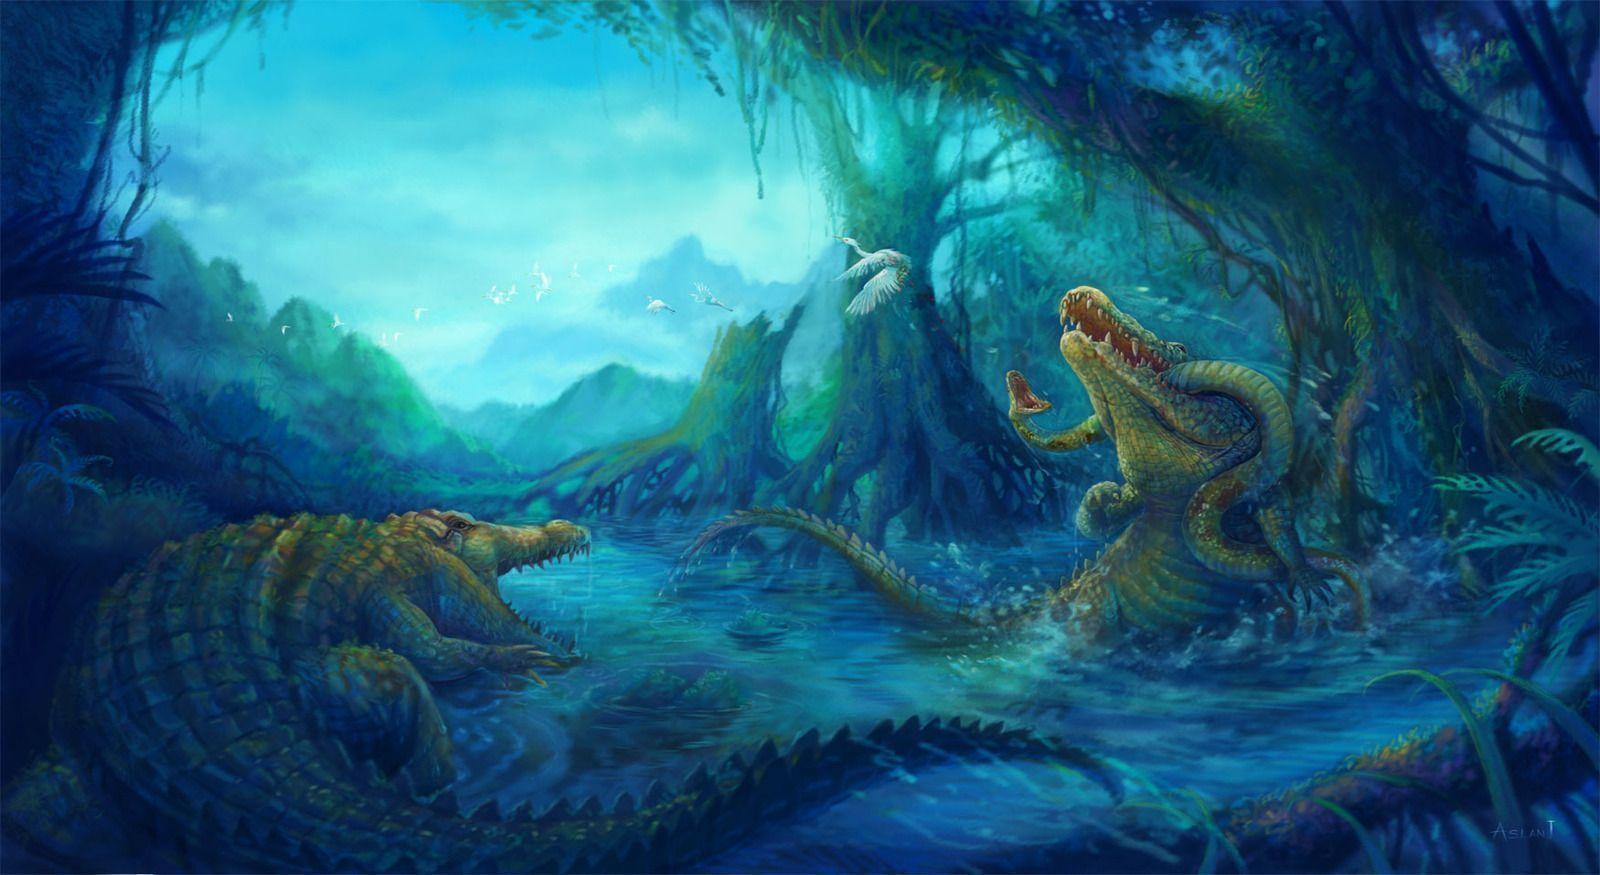 Alligator Computer Wallpapers, Desktop Backgrounds HD